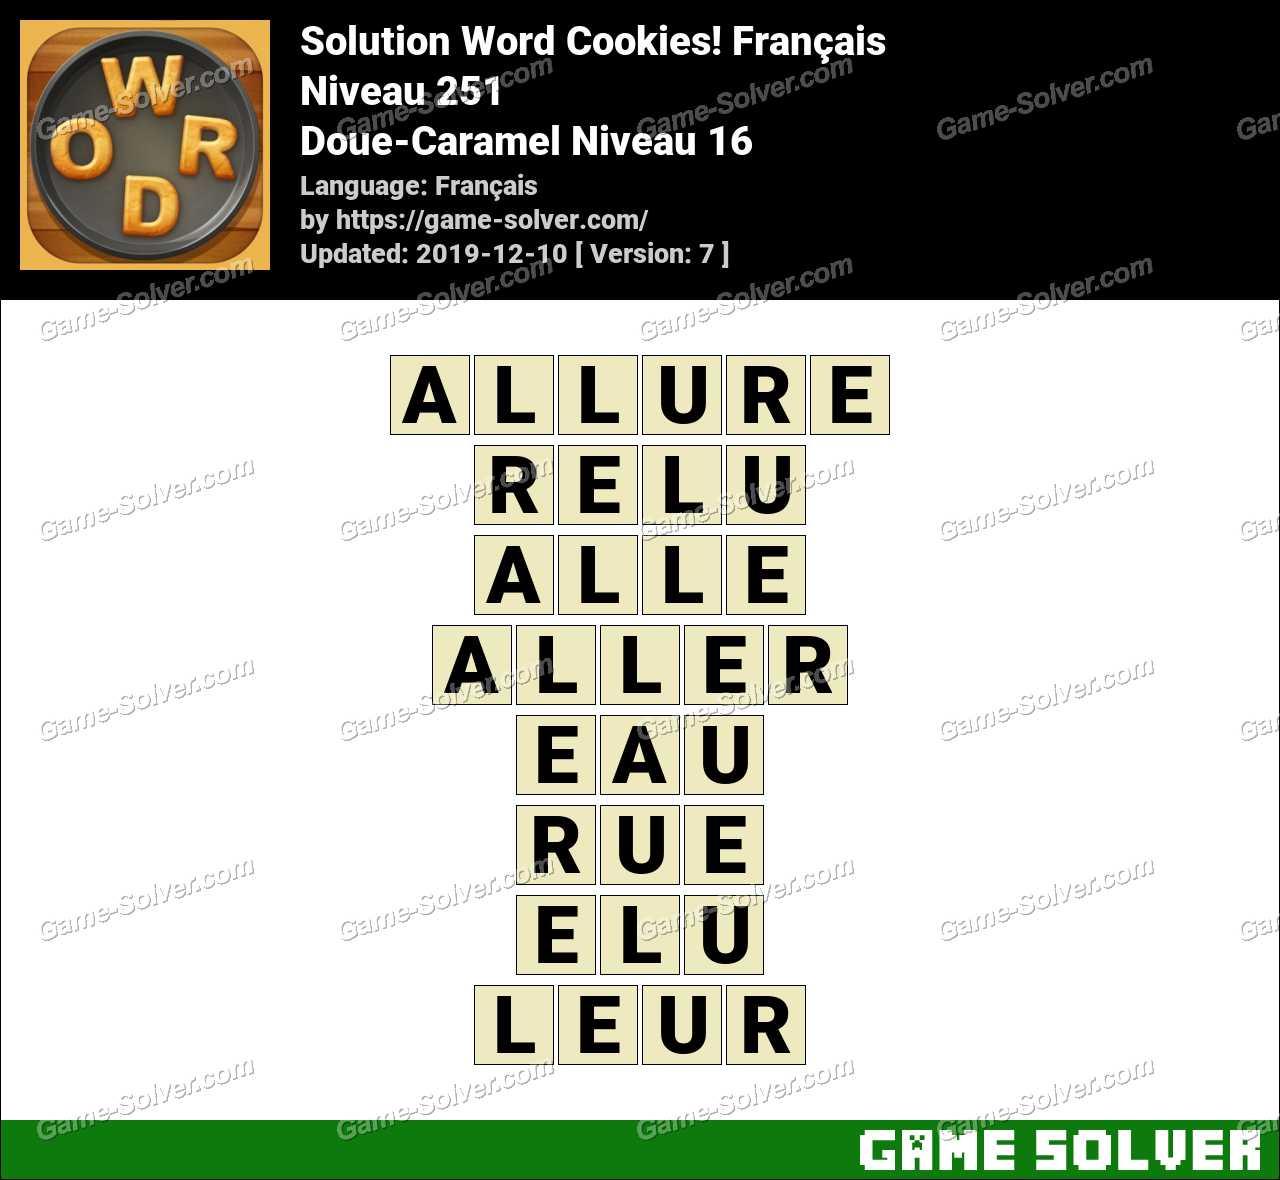 Solution Word Cookies Doue-Caramel Niveau 16